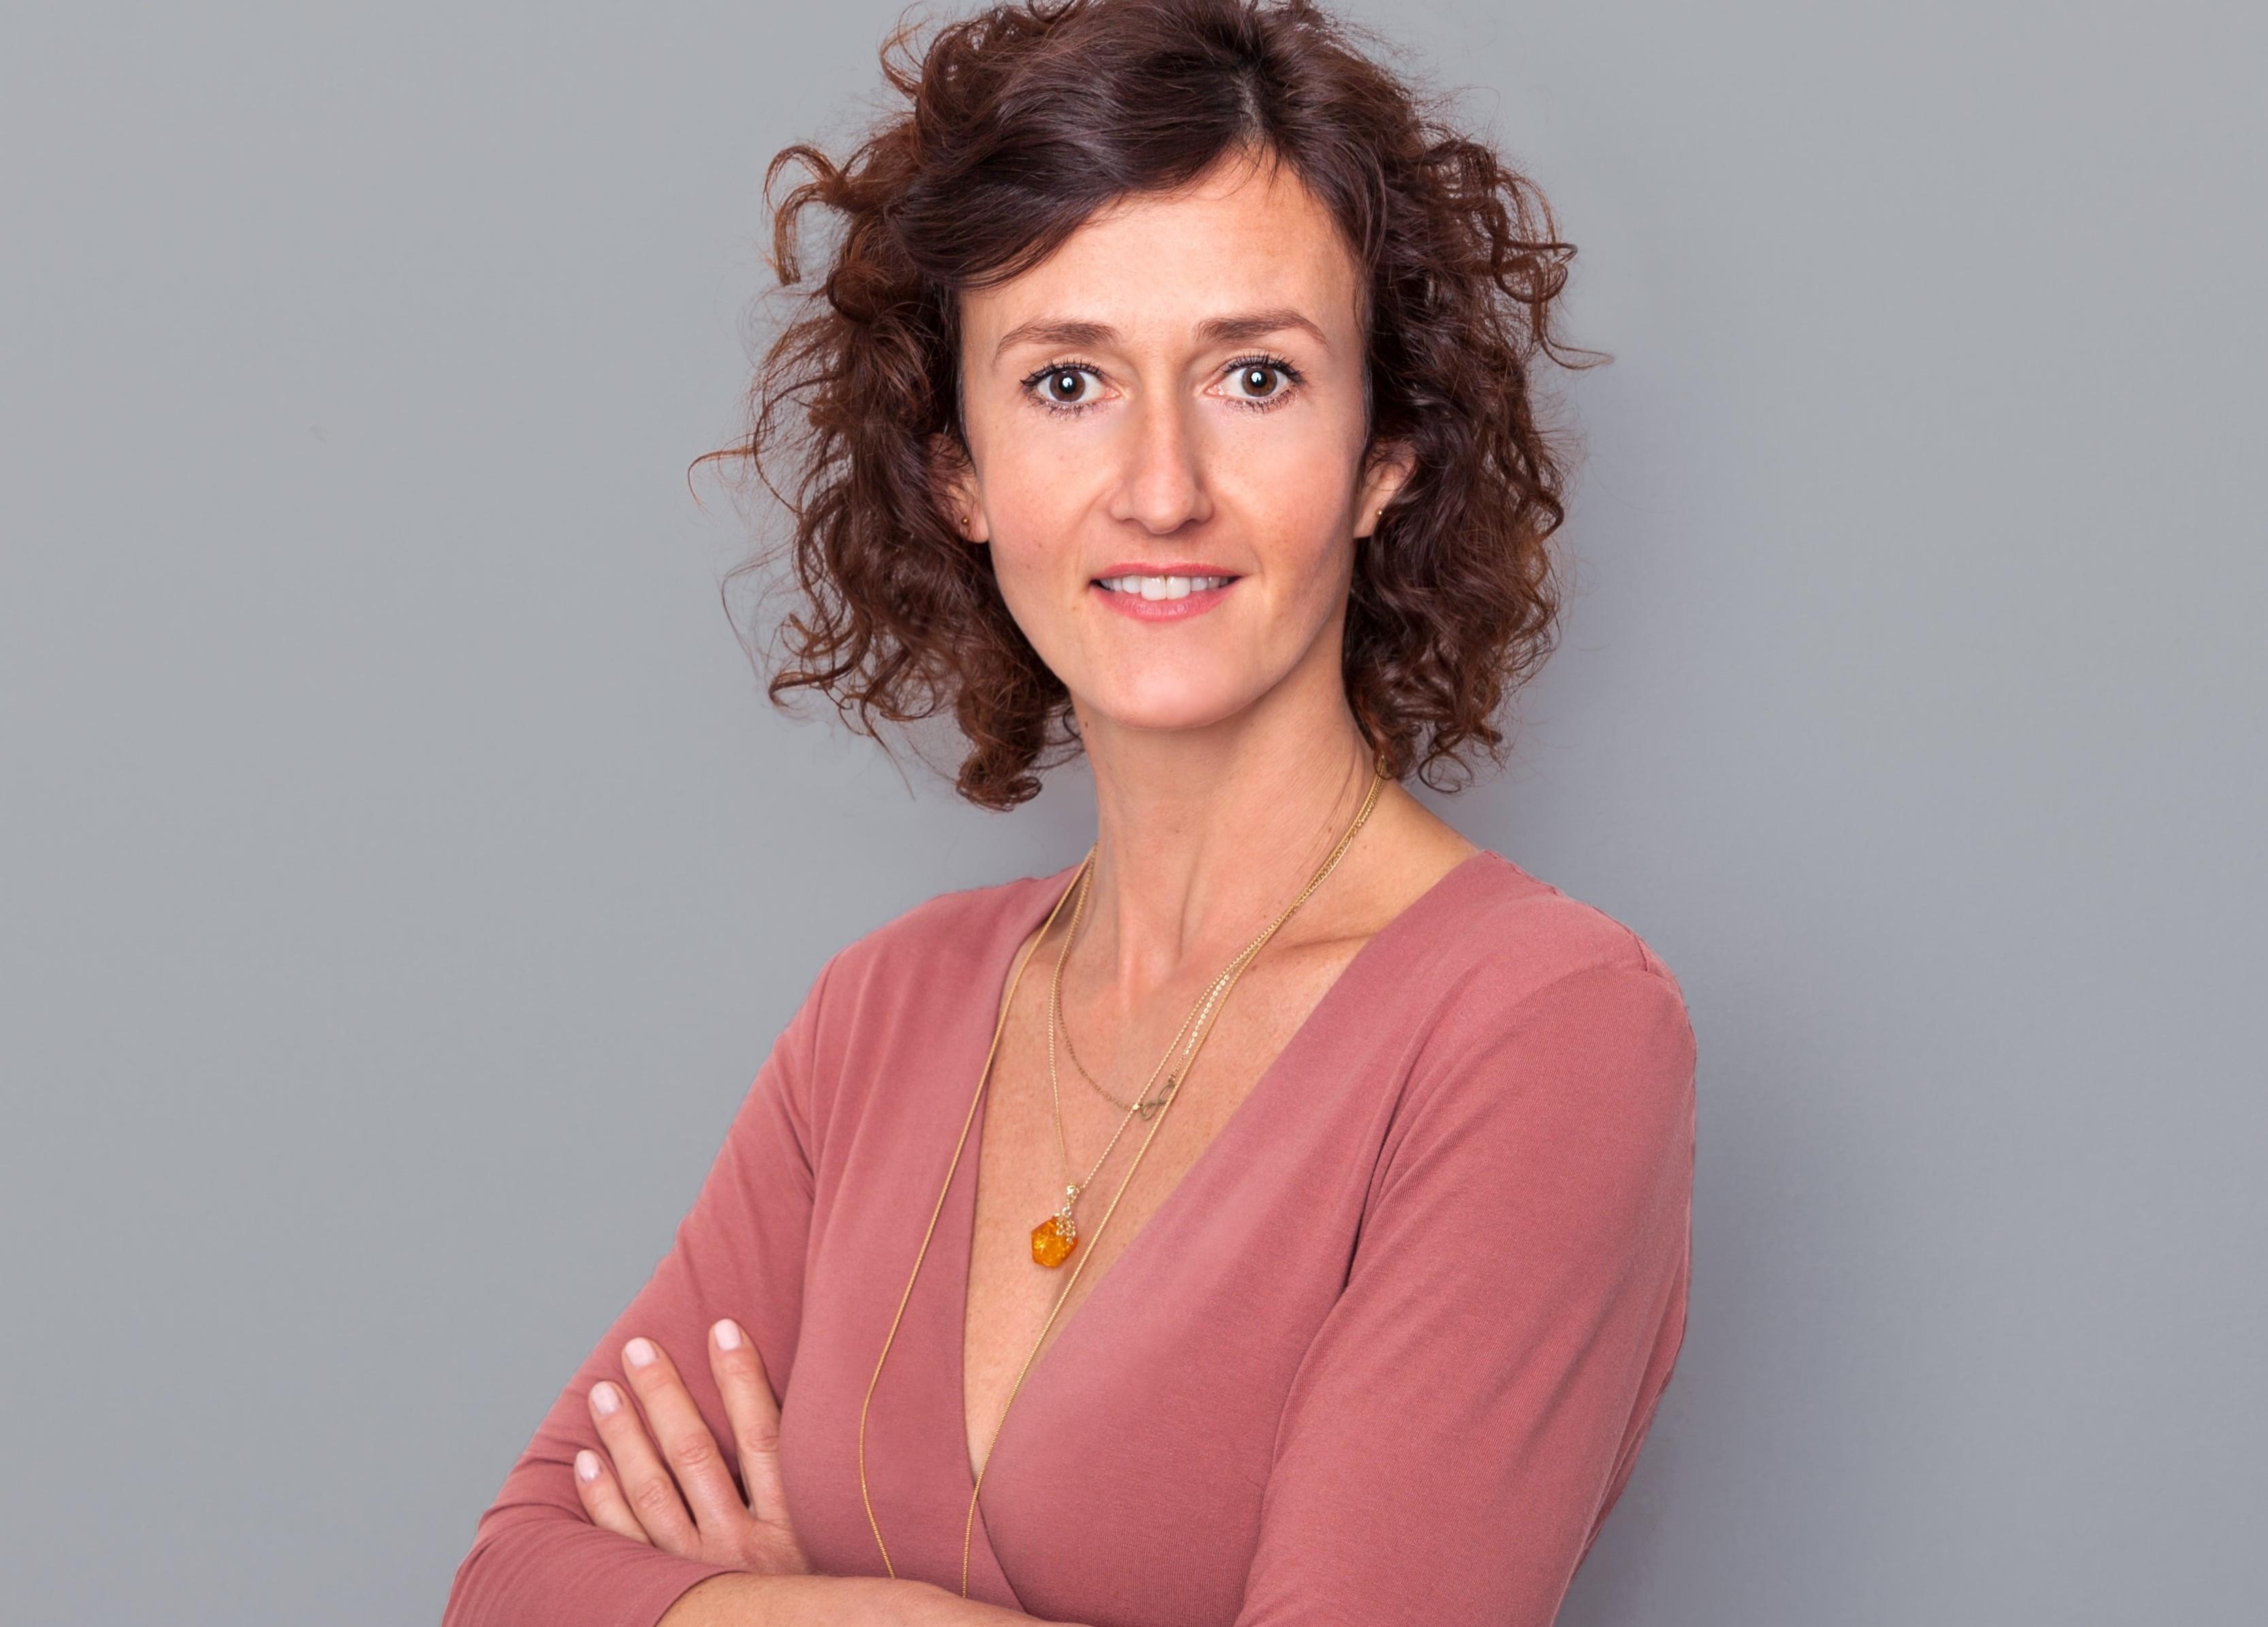 Klaudia Grabarczyk